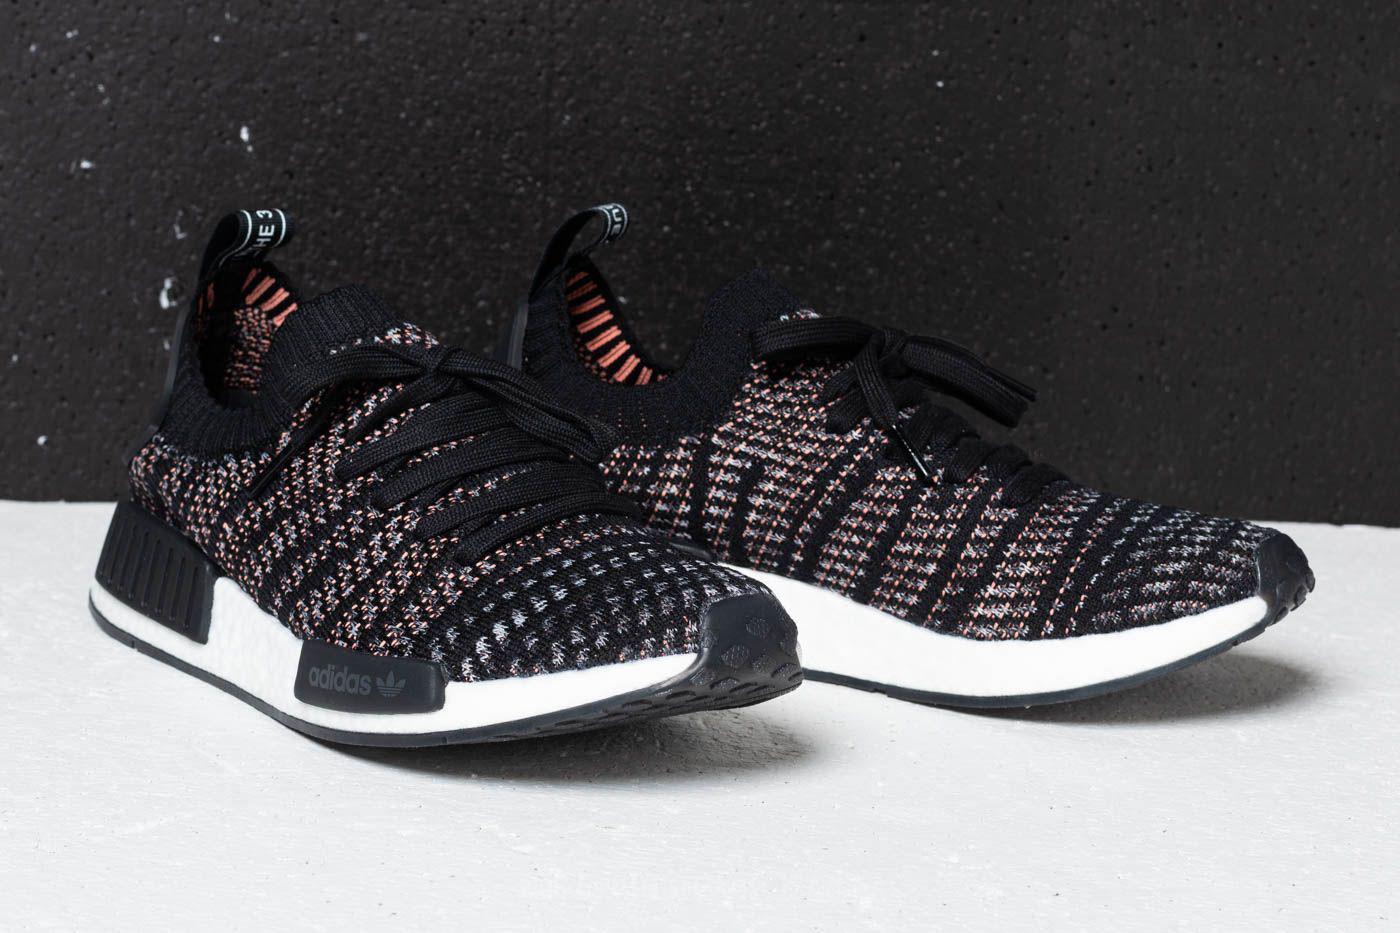 ea1ab61fe173f Lyst - adidas Originals Adidas Nmd r1 Stlt Primeknit Core Black ...